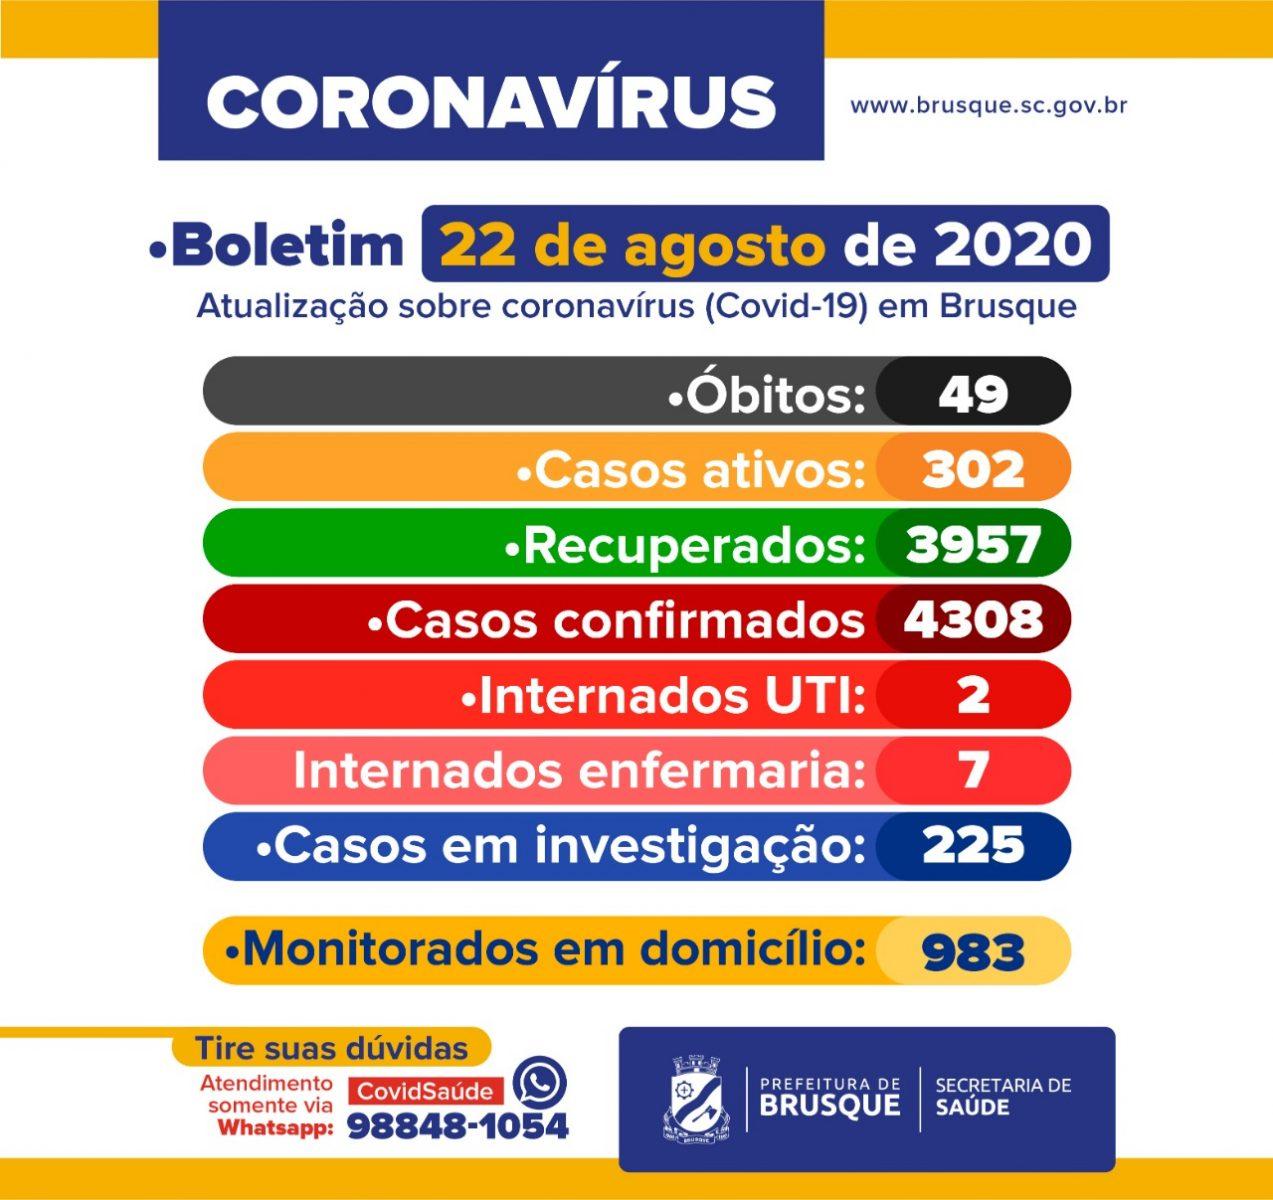 COVID-19: Boletim epidemiológico 22 de agosto